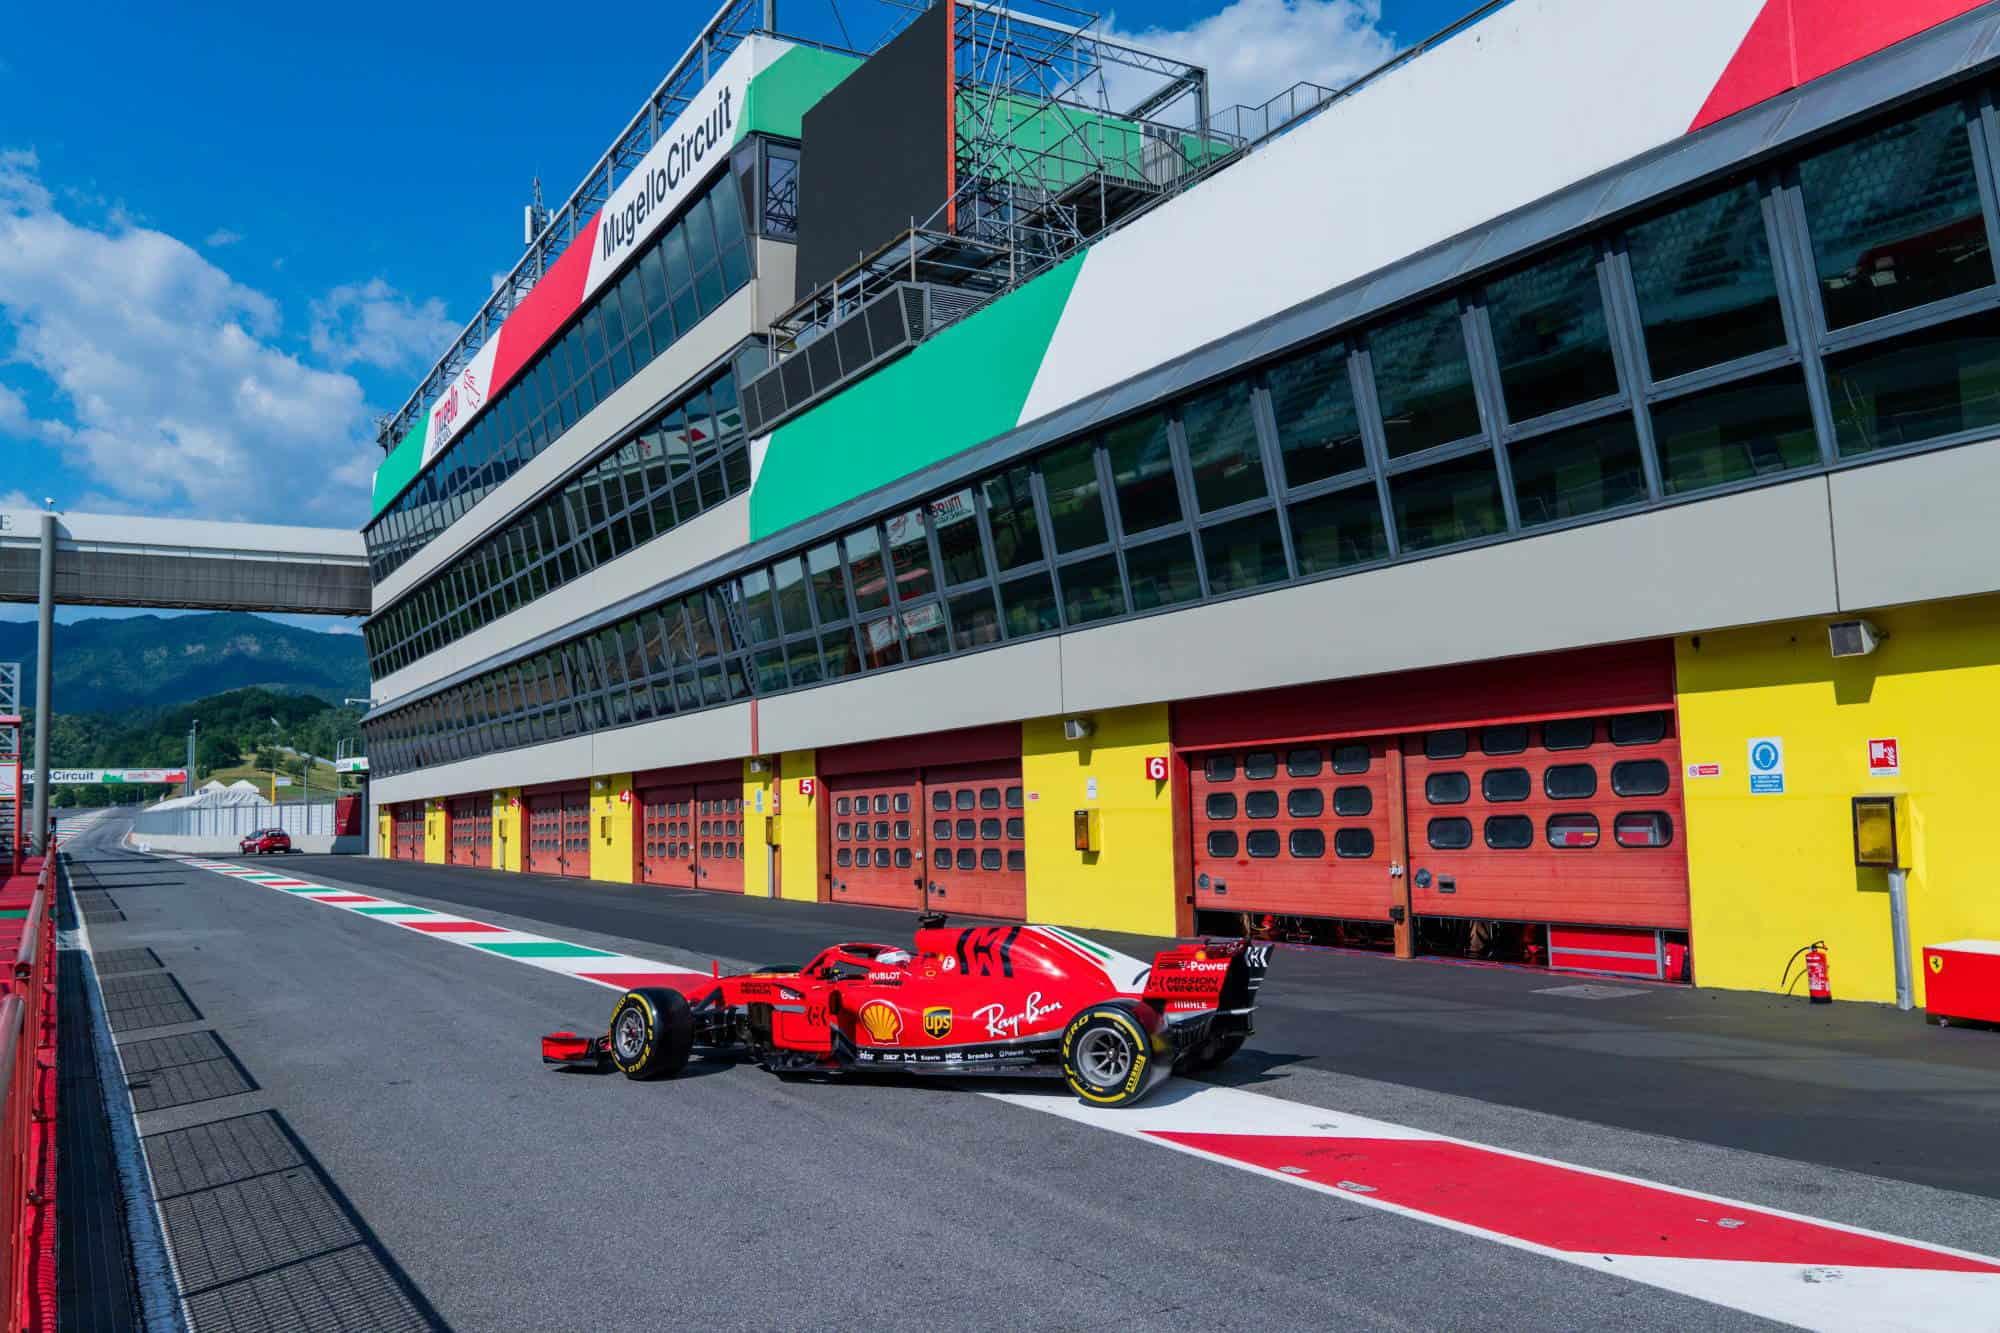 Leclerc Ferrari SF71H Mugello test 23rd June 2020 Photo Ferrari